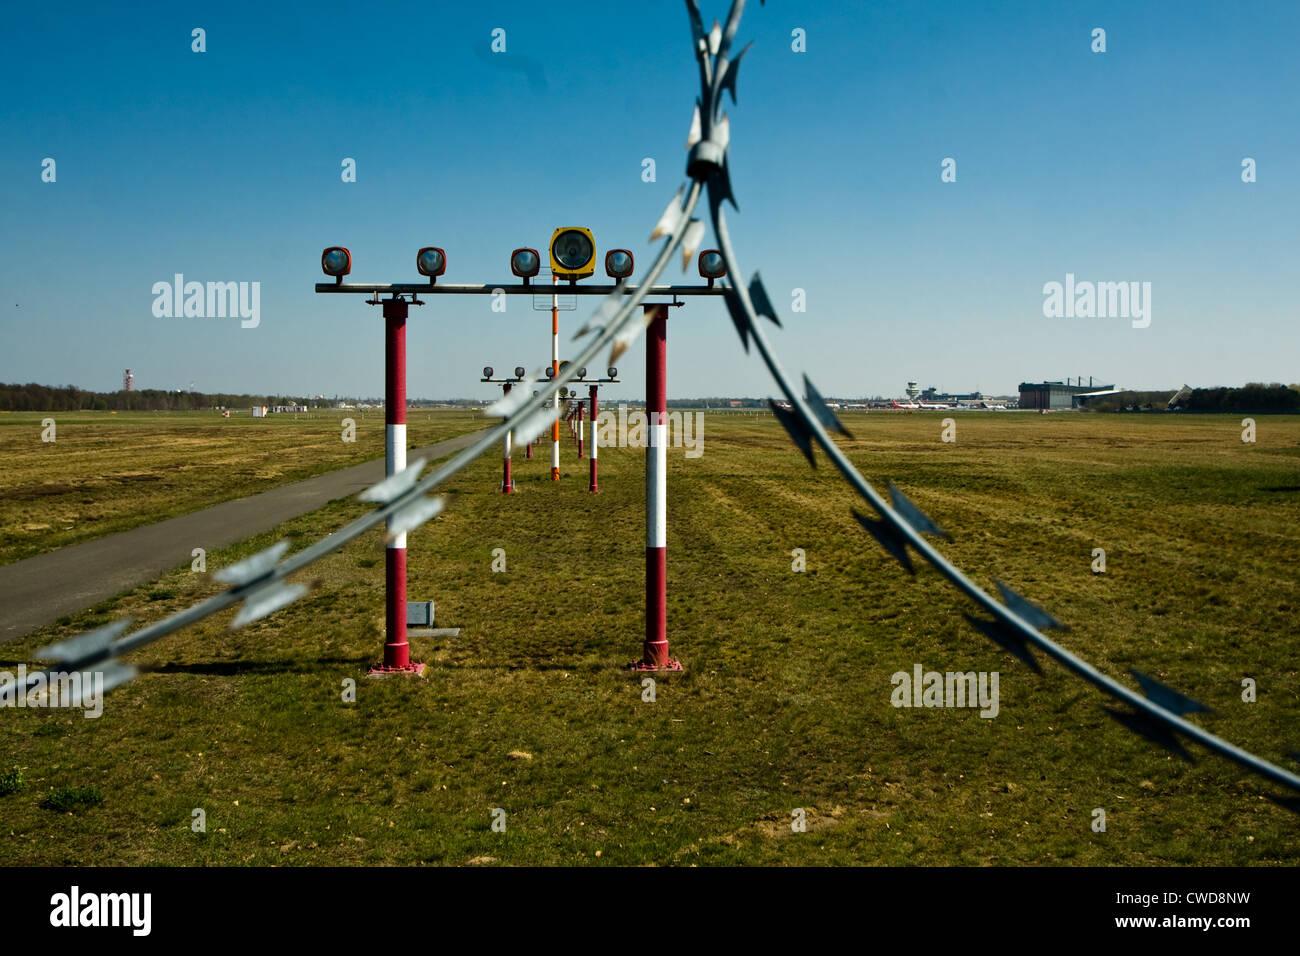 airfield,guiding light - Stock Image